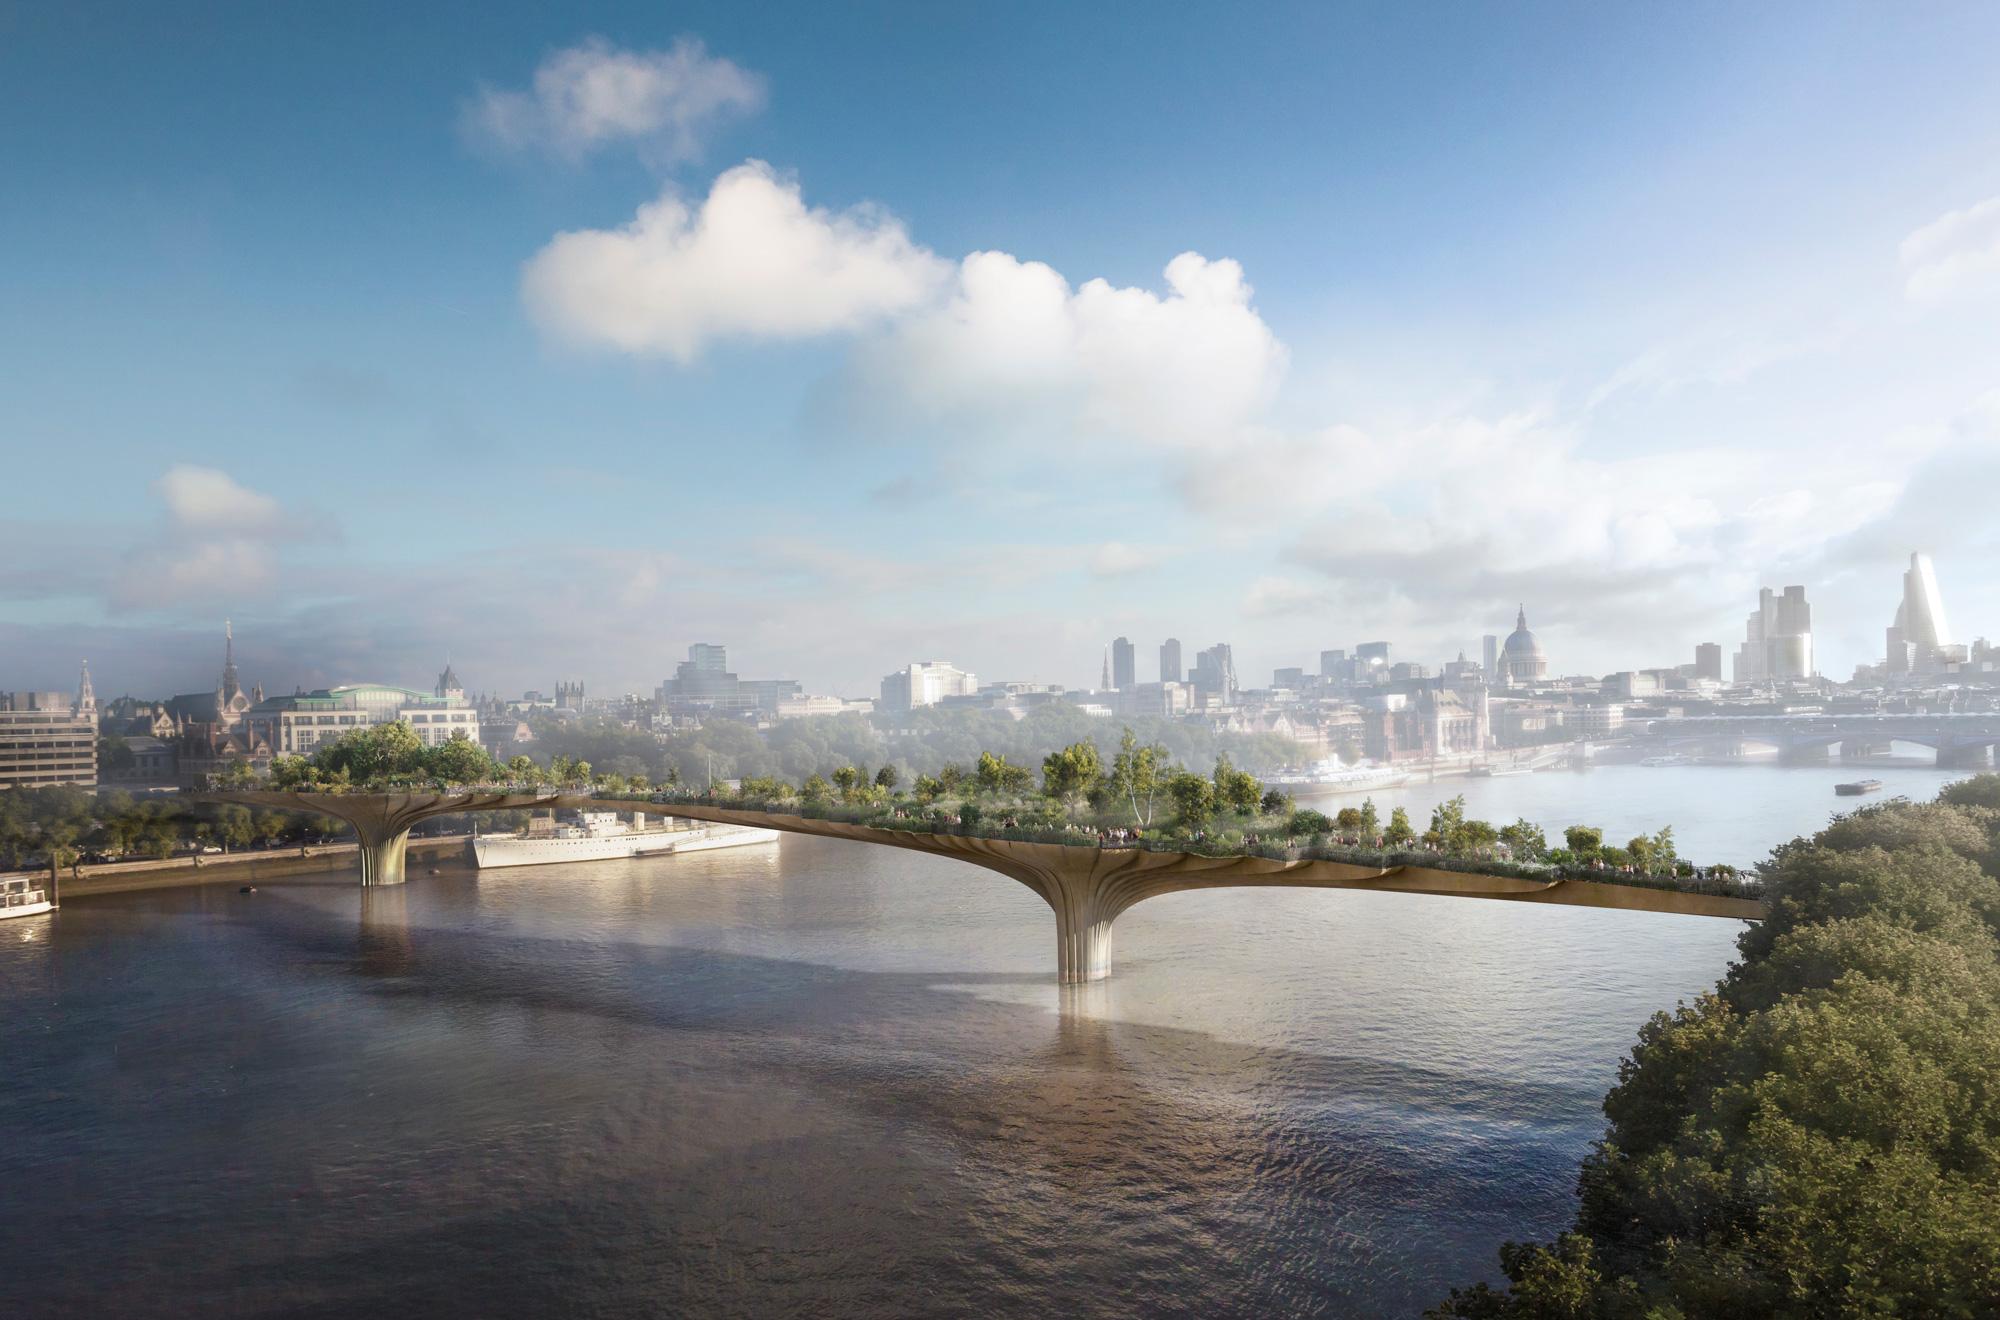 https://www.dotmug.net/wp-content/uploads/2015/06/london-garden-bridge.jpg